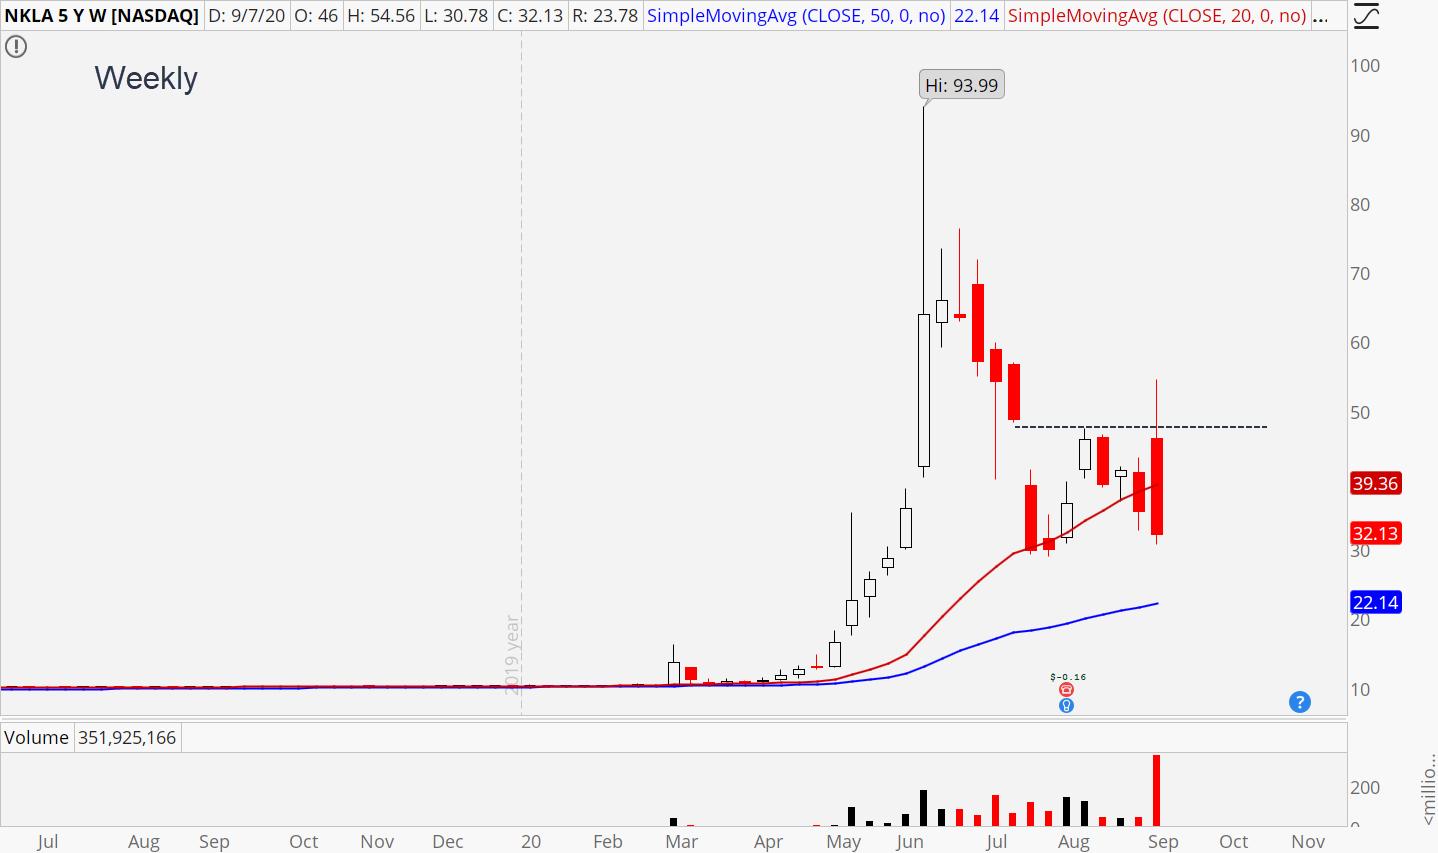 Nikola (NKLA) stock weekly chart showing massive bearish engulfing candle